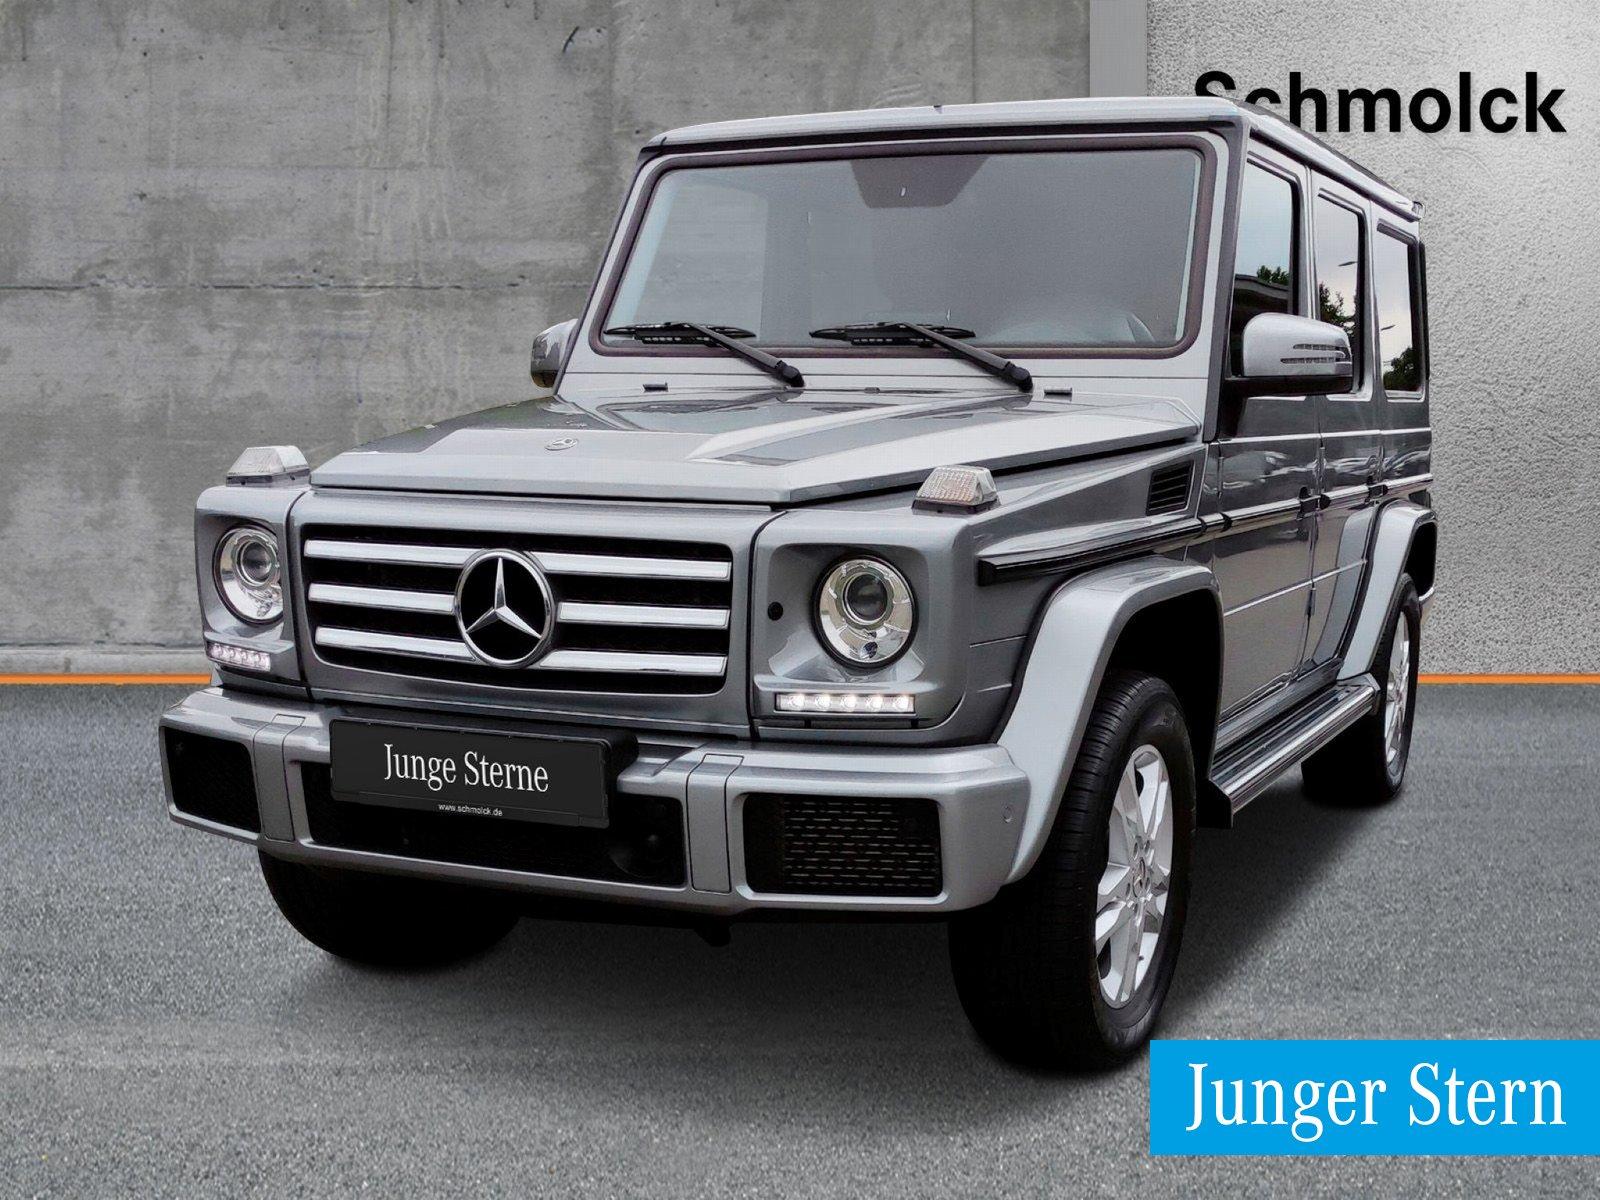 Mercedes-Benz G 350 d COMAND/DSTR/SHD/KAMERA/AHK/TOTW/HARMAN++, Jahr 2017, Diesel